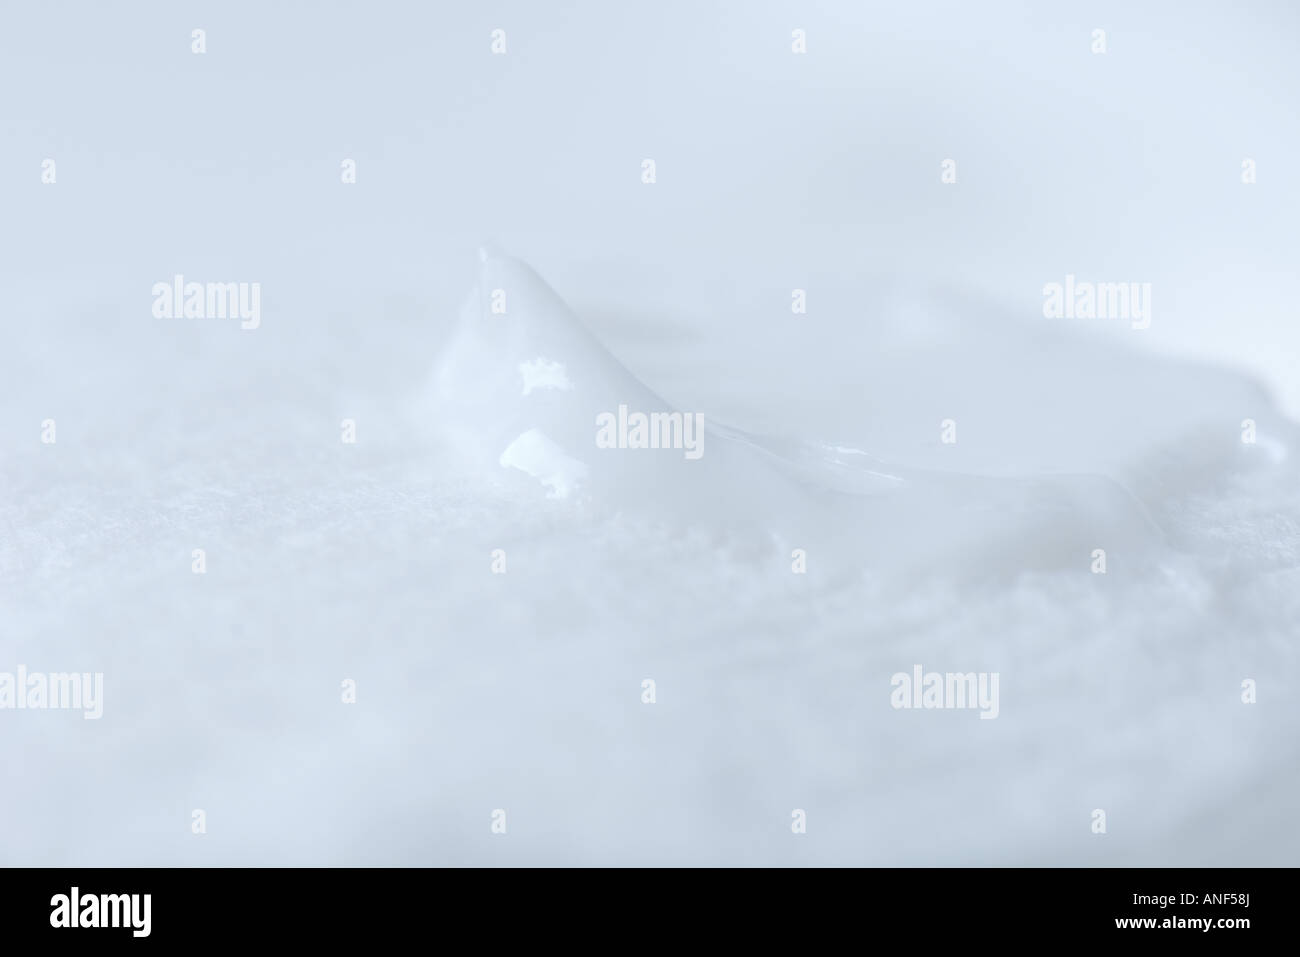 Lotion auf Wattepad, extreme Nahaufnahme Stockbild